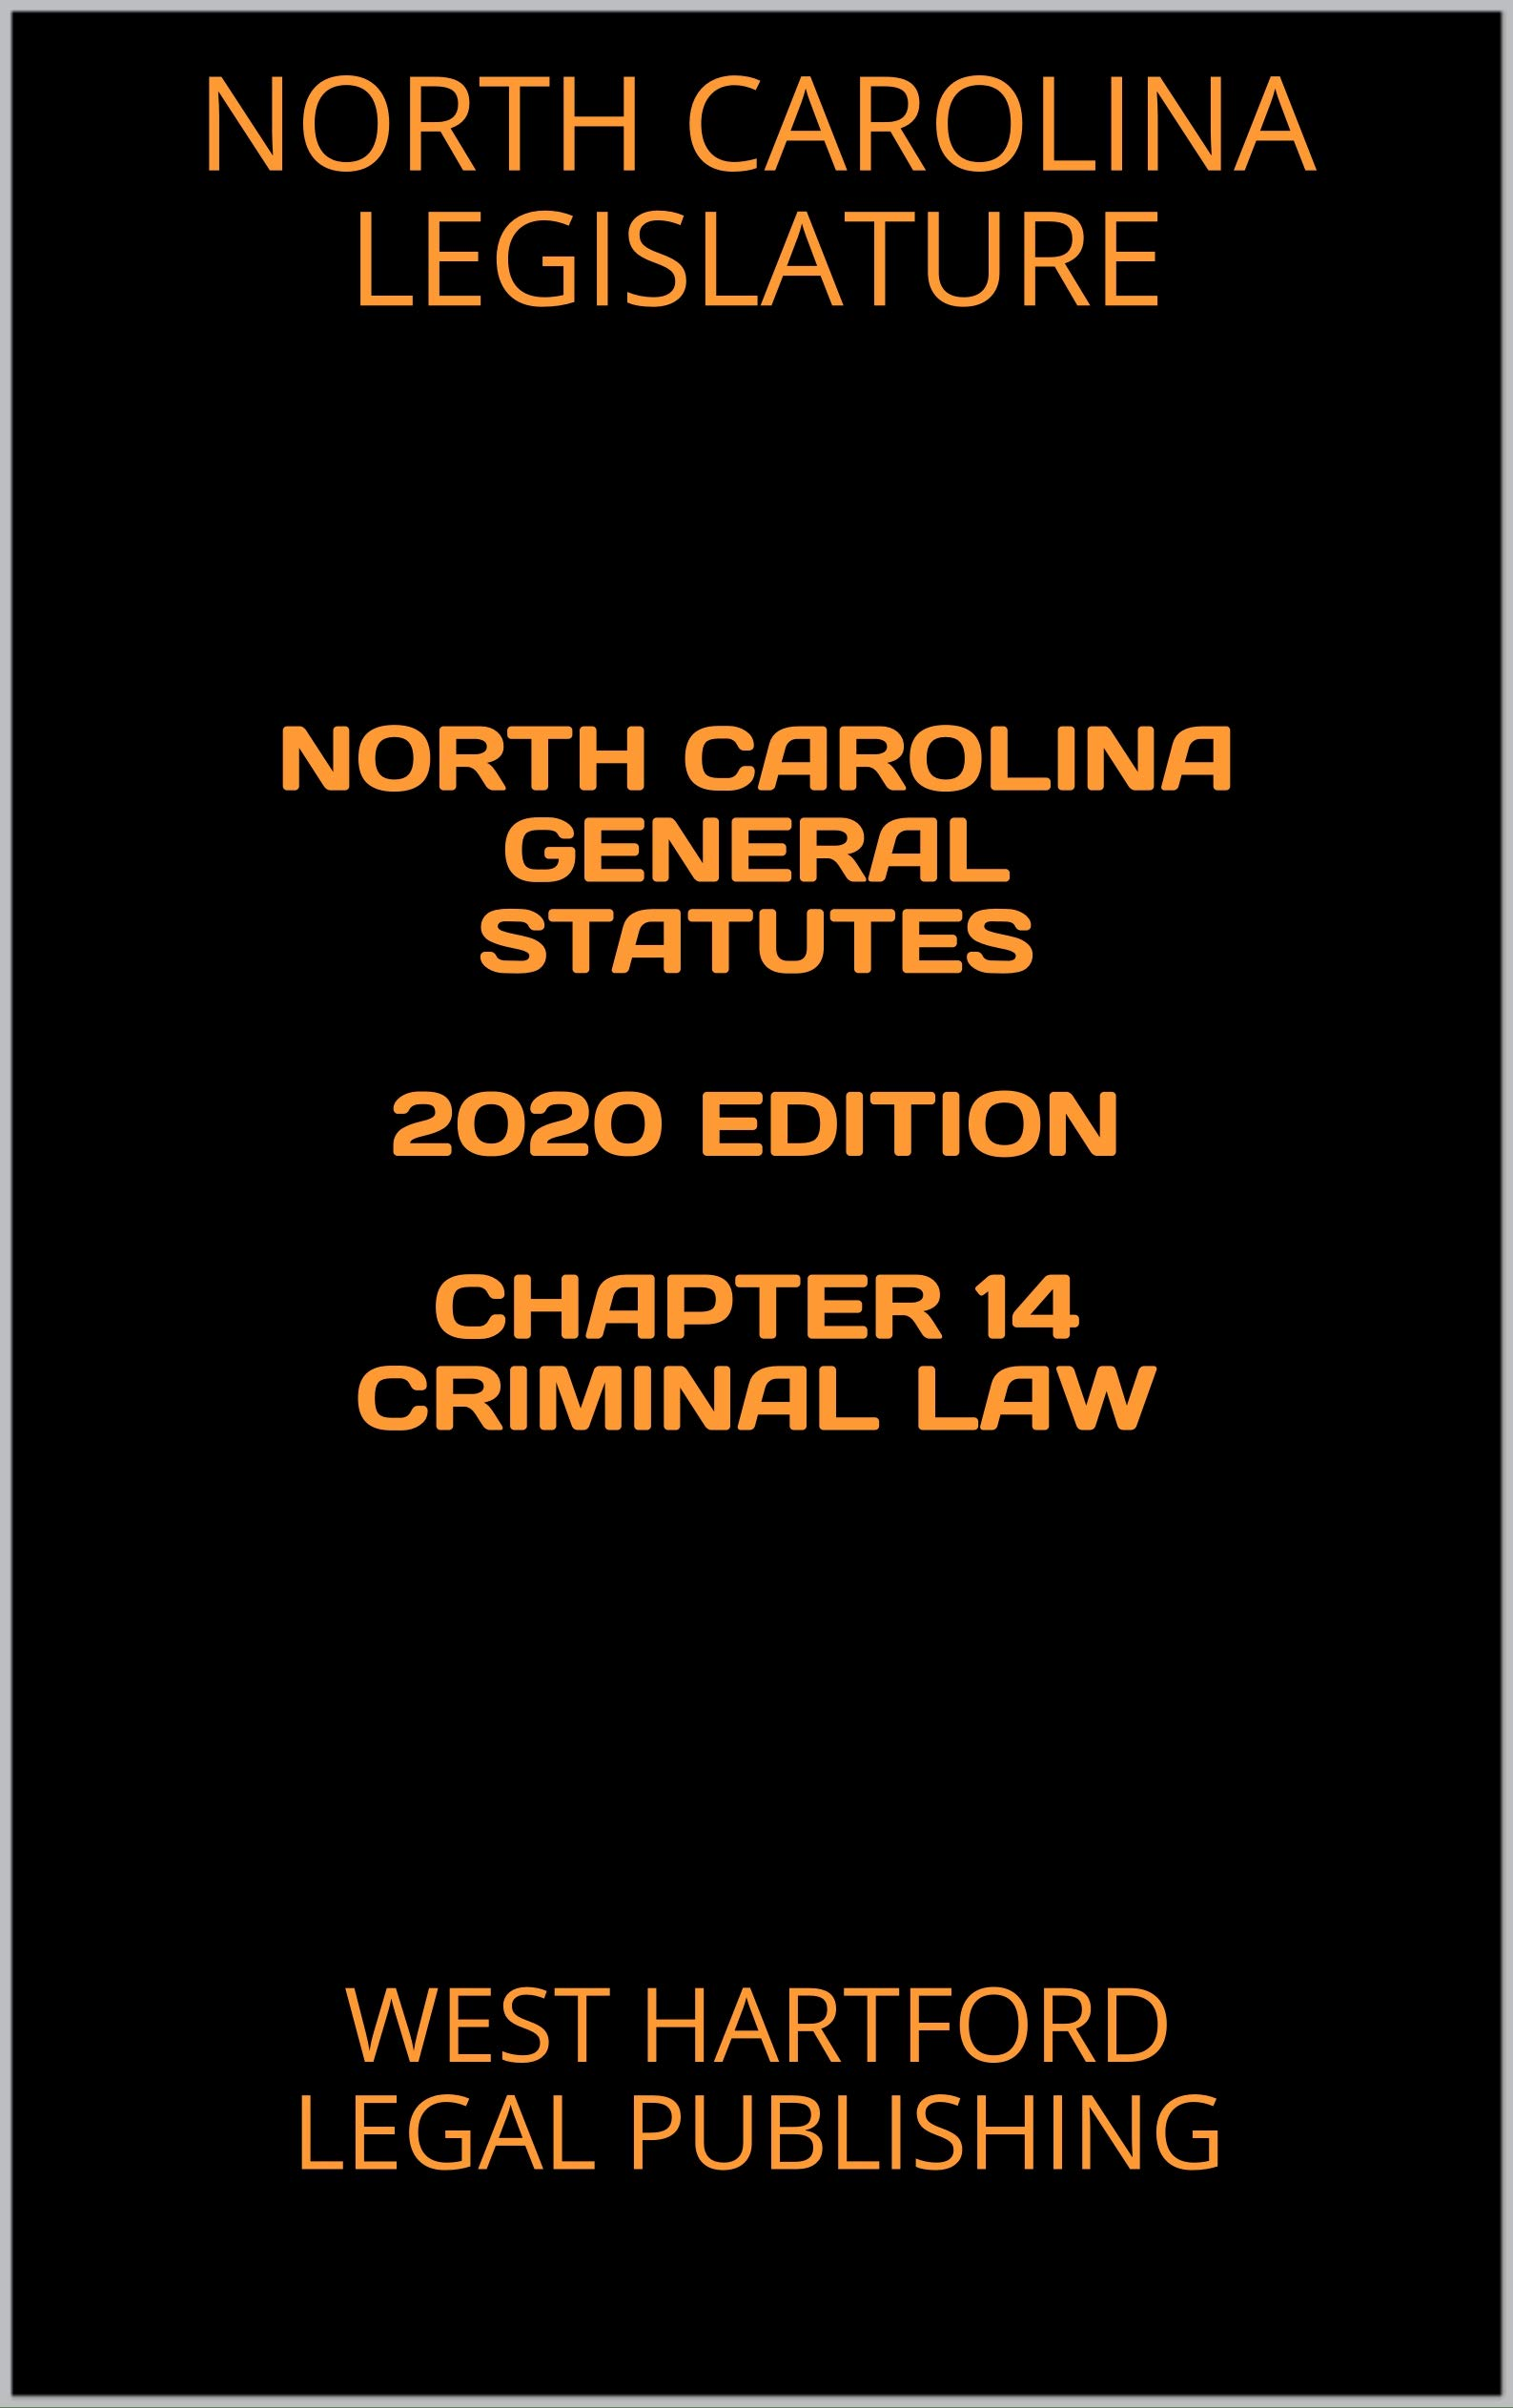 NORTH CAROLINA GENERAL STATUTES 2020 EDITION CHAPTER 14 CRIMINAL LAW: WEST HARTFORD LEGAL PUBLISHING